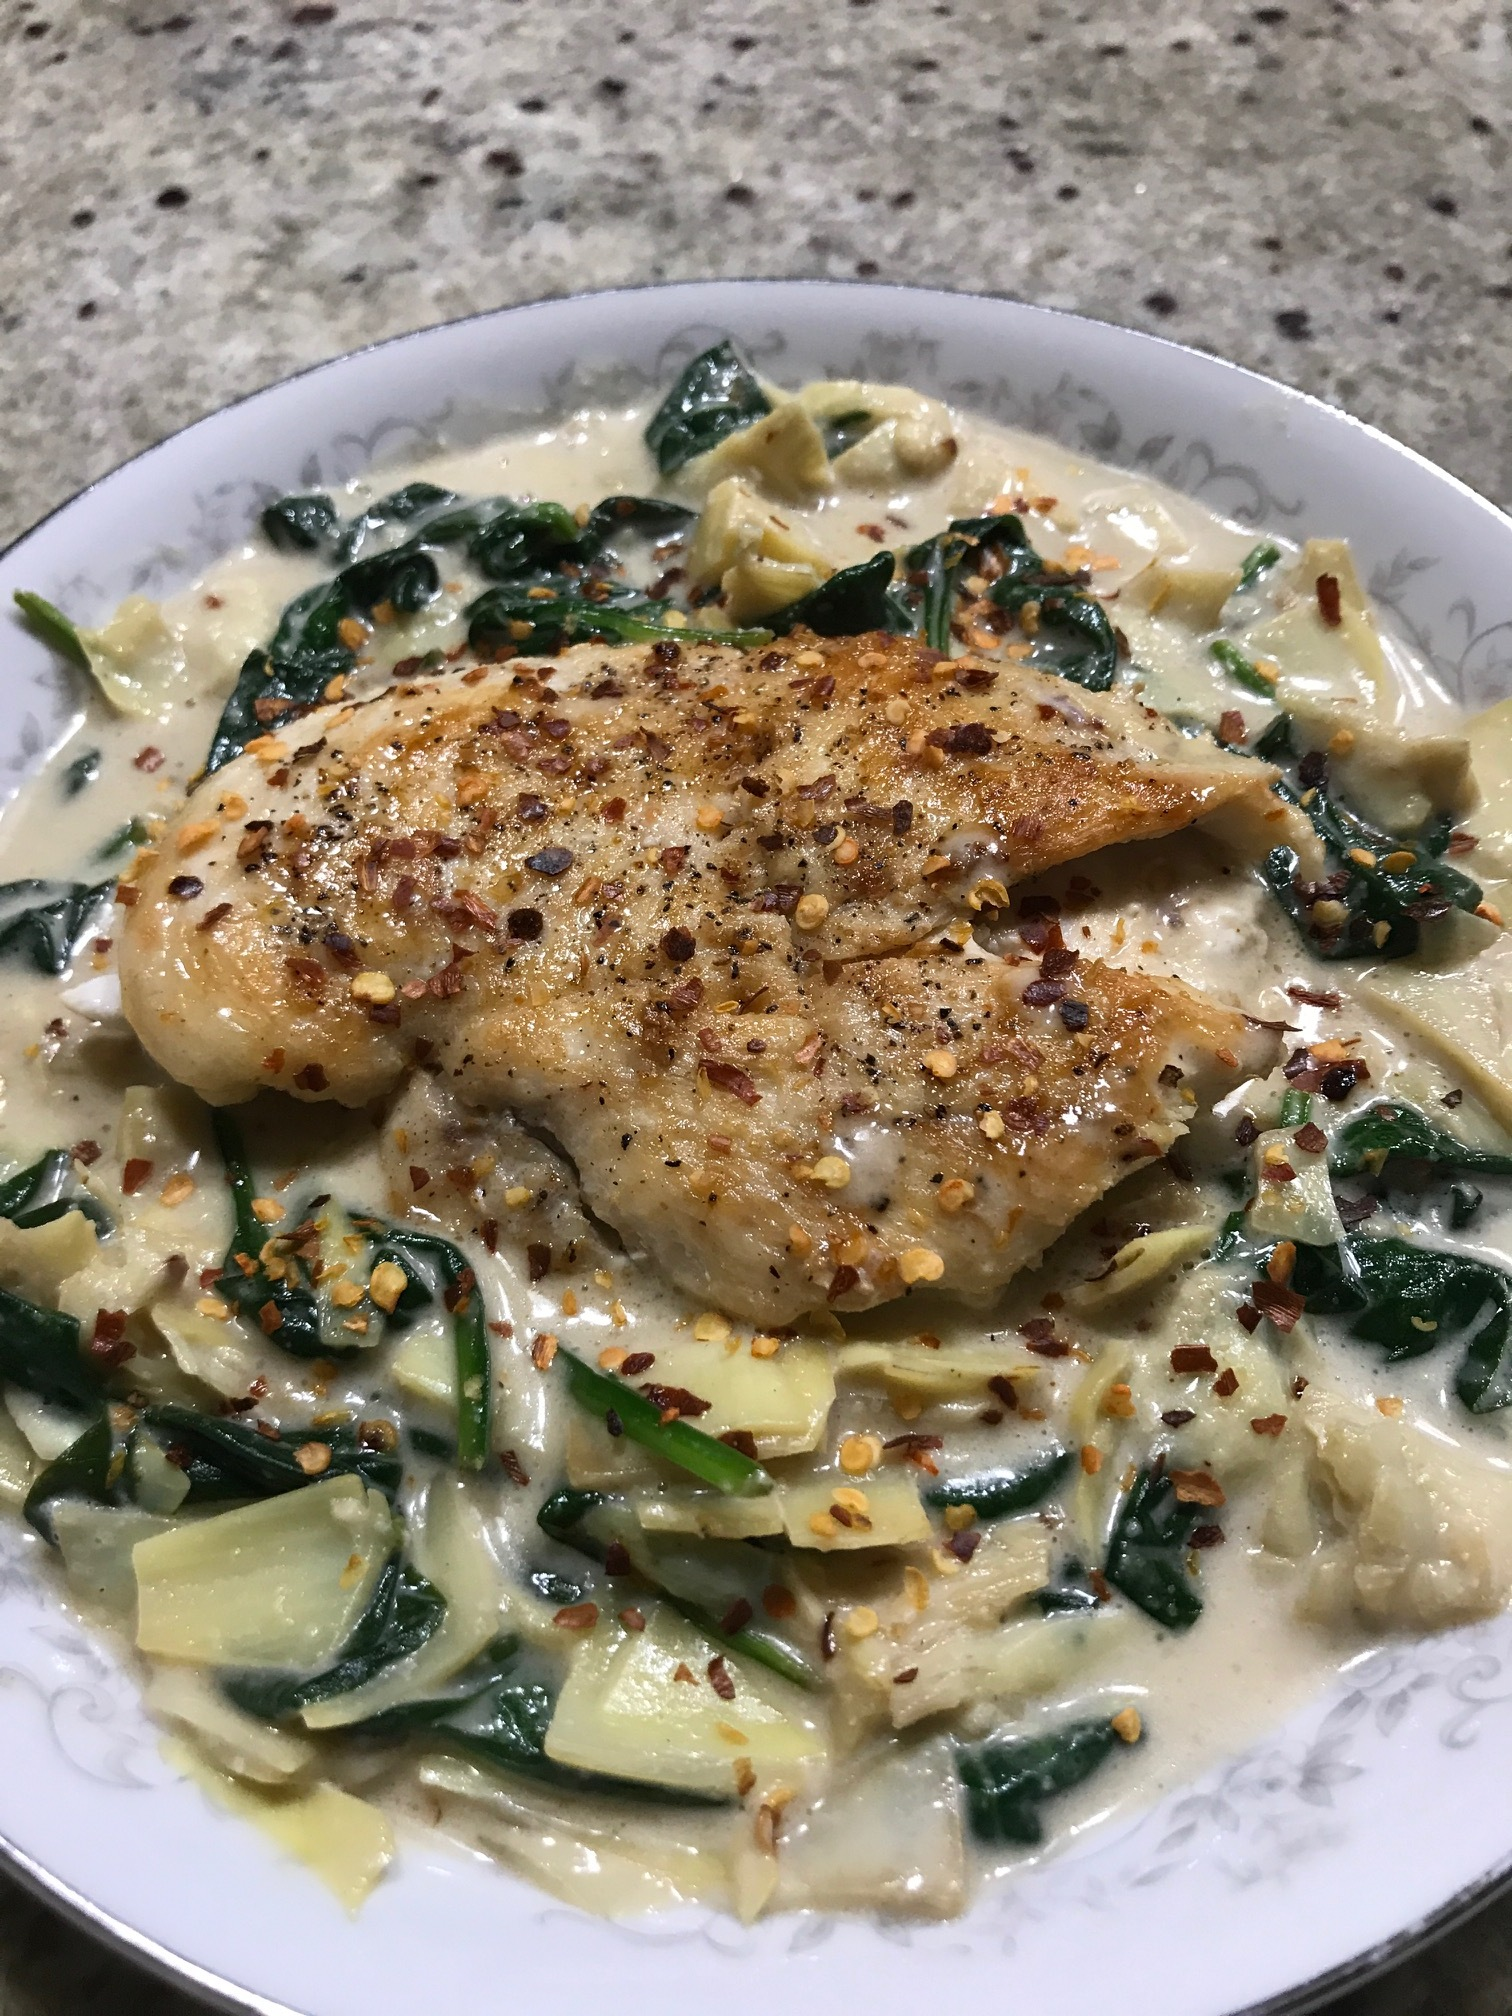 Chicken with Creamy Spinach Artichoke Sauce - Paleo & Whole 30